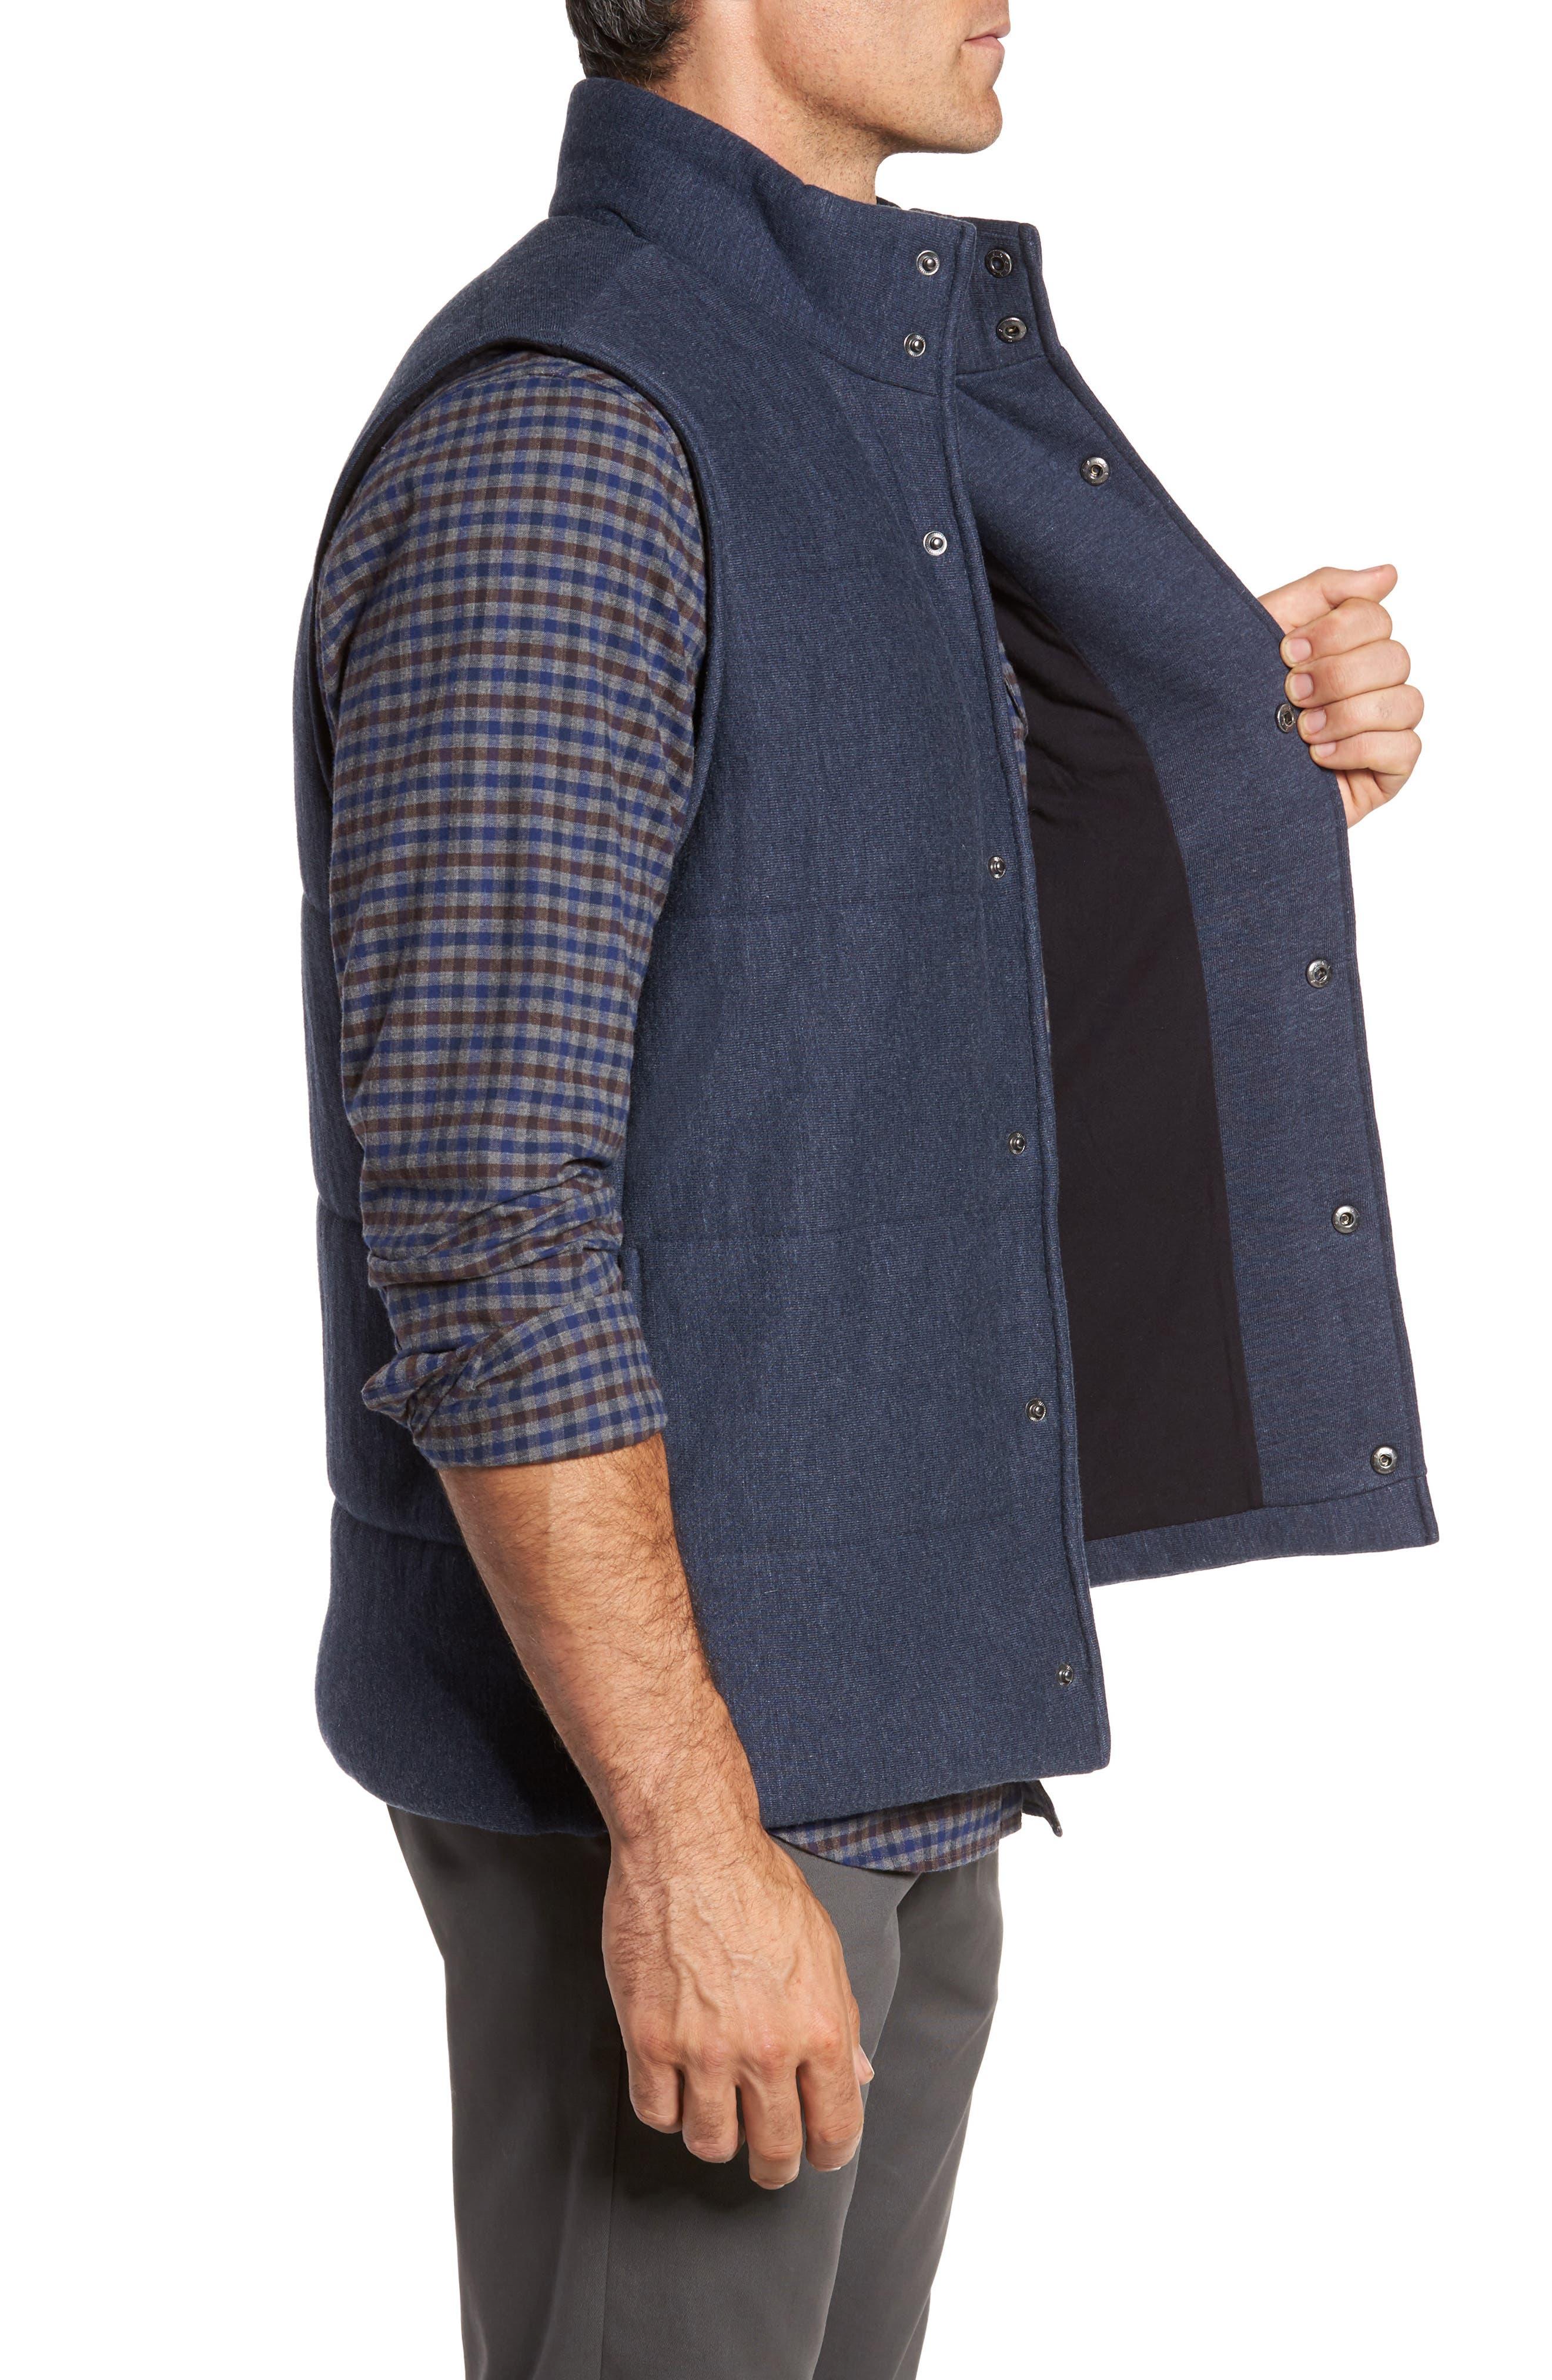 Quilted Fleece Vest,                             Alternate thumbnail 3, color,                             Navy Iris Heather